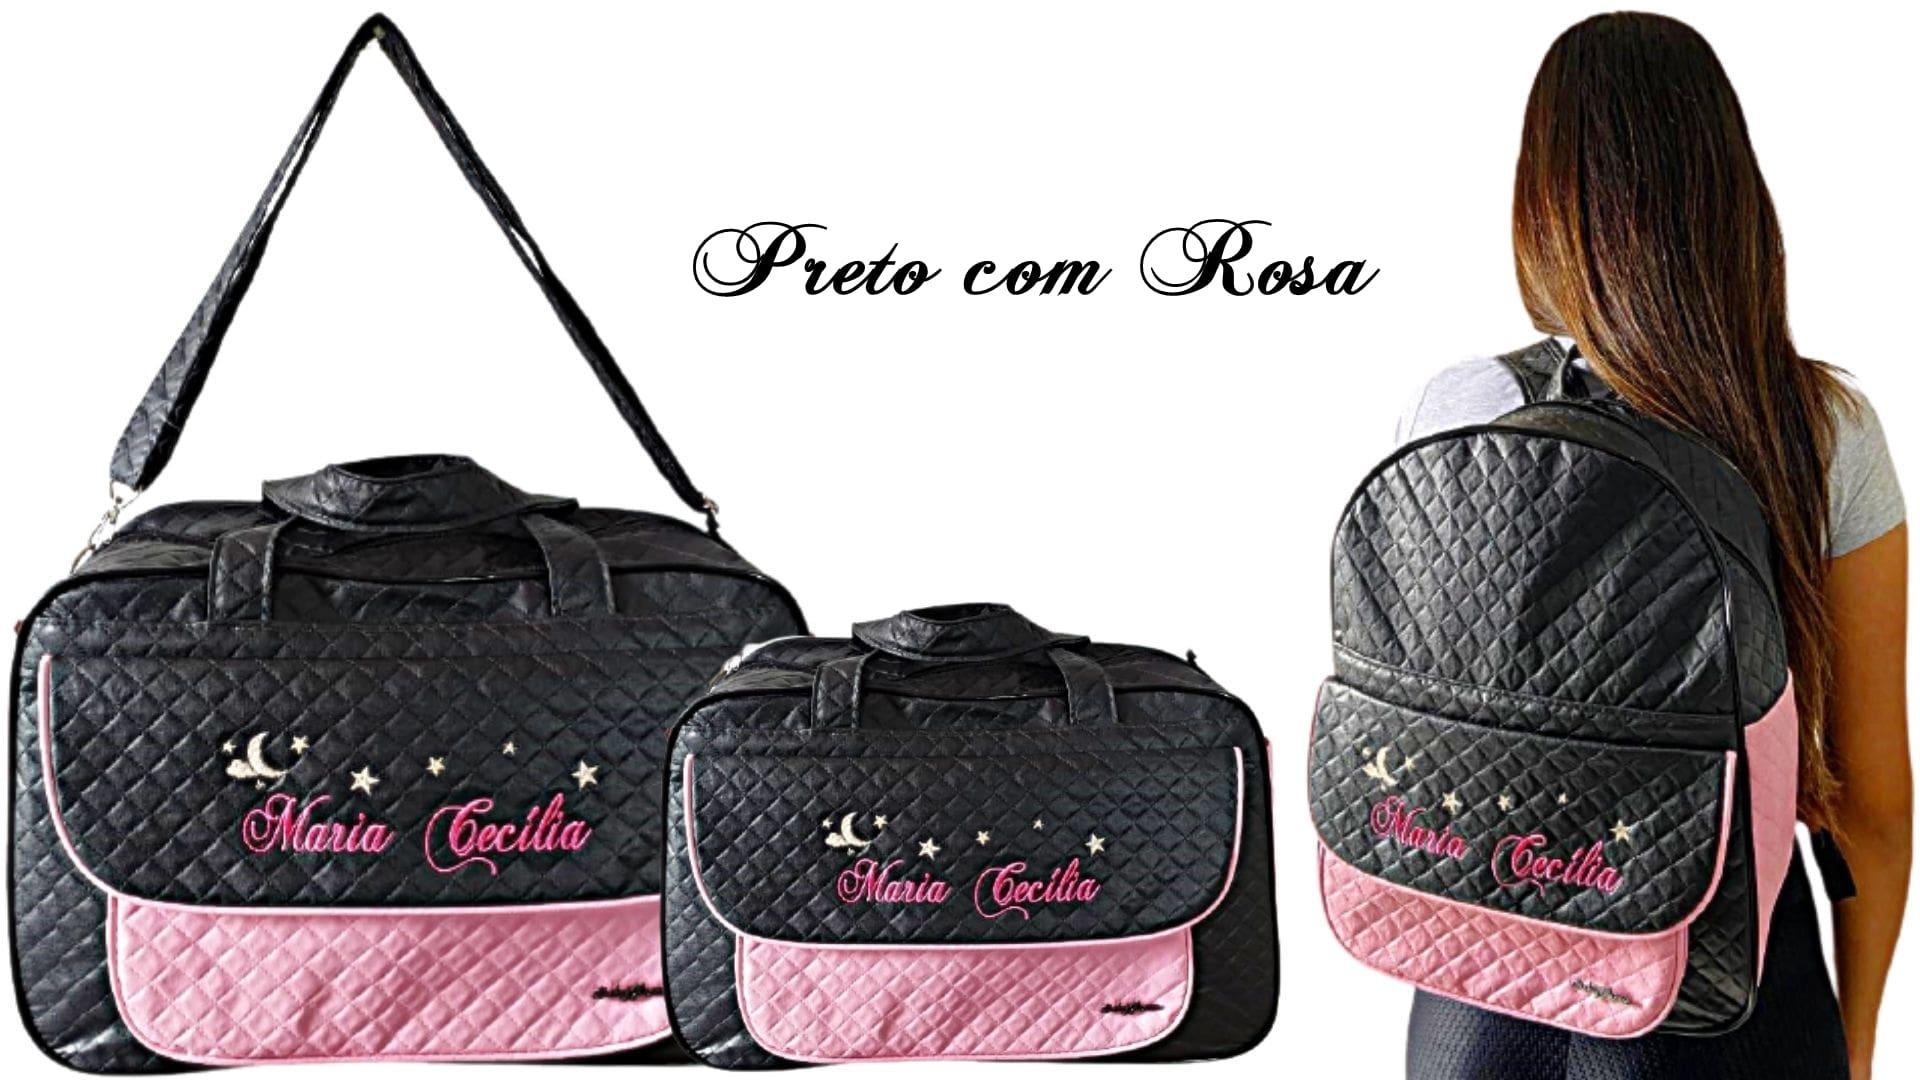 Kit Bolsa grande + Bolsa Pequena + Mochila  Maternidade Personalizadas Menina 3pçs